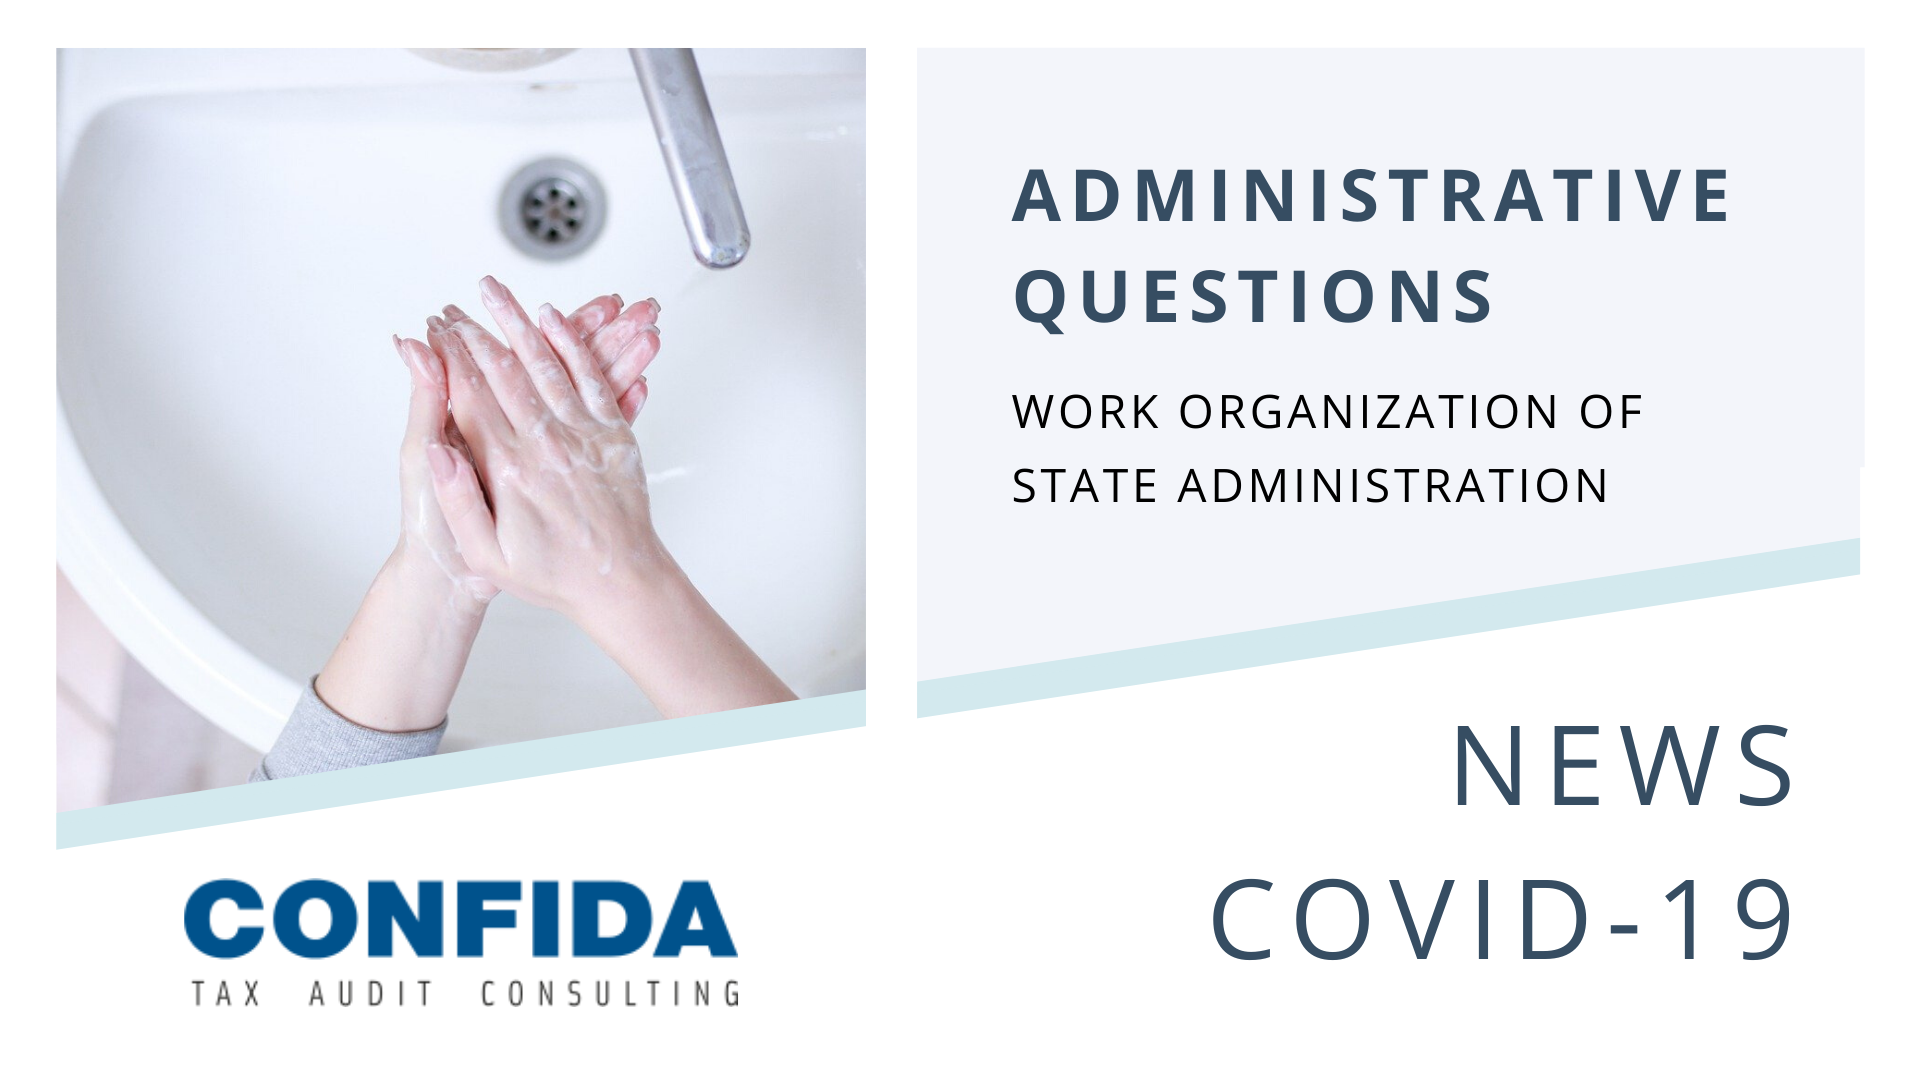 COVID-19: Administrative Questions